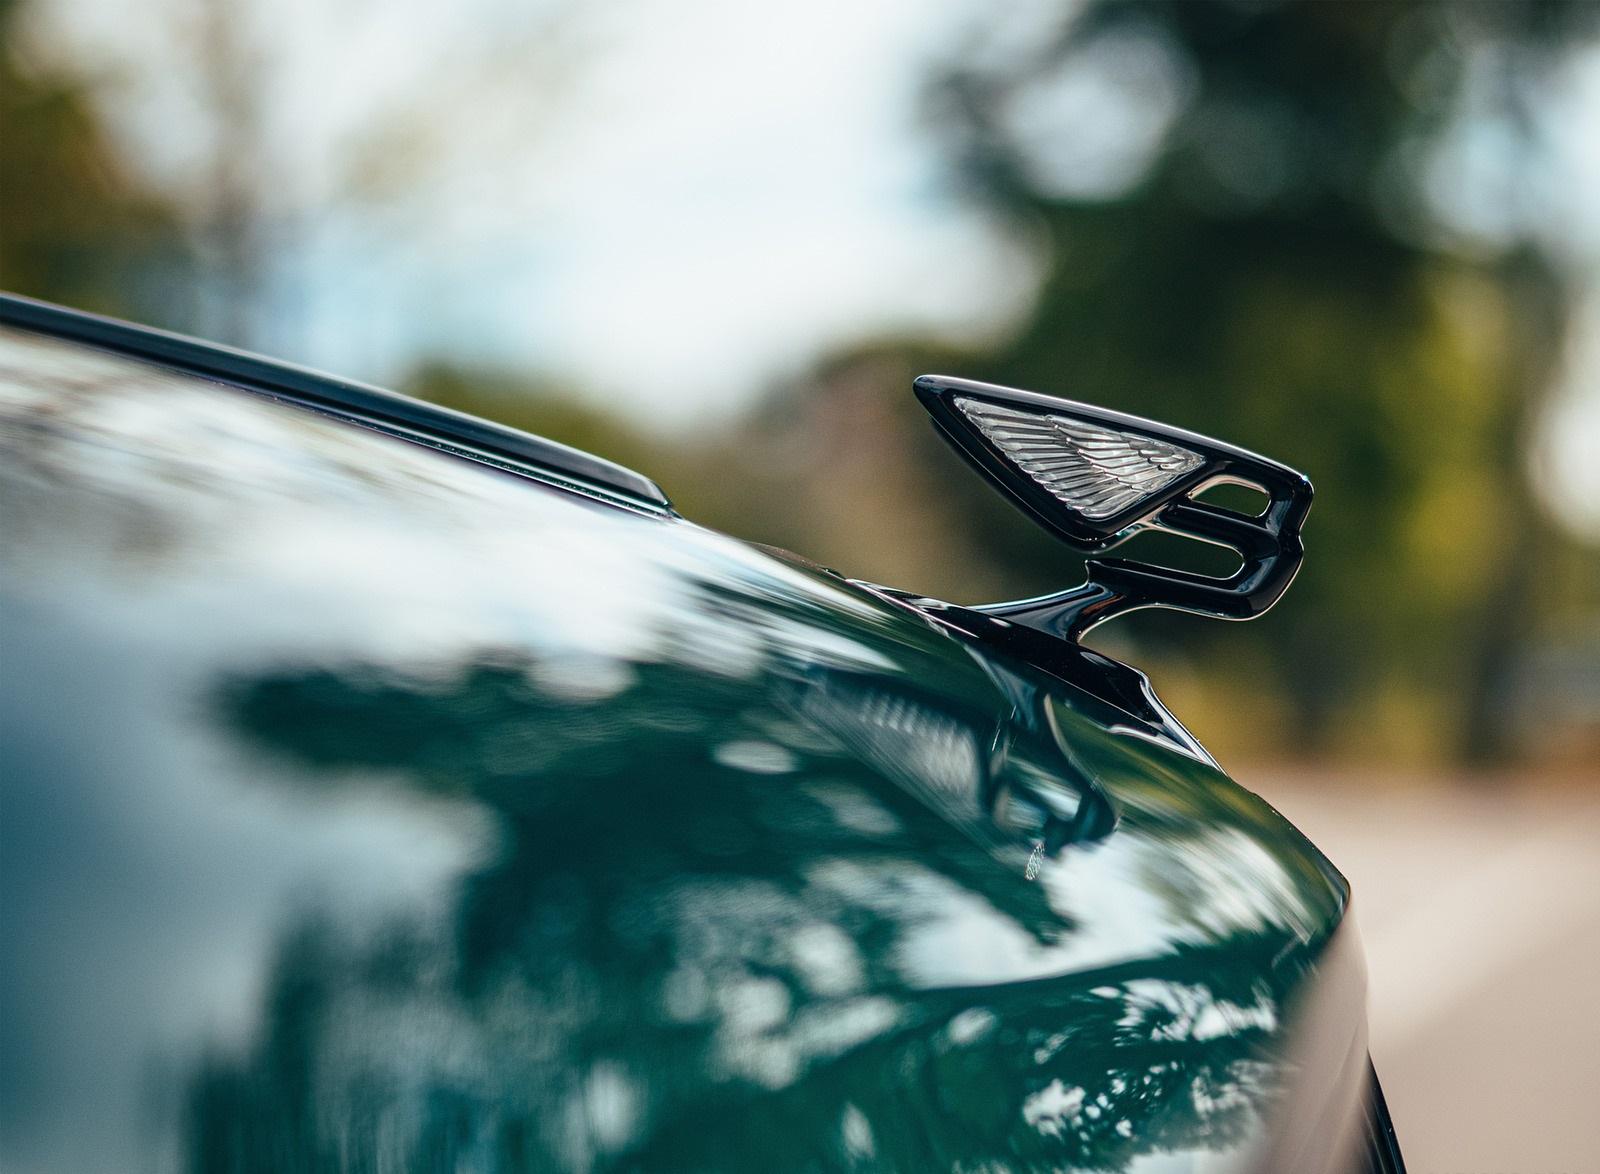 2022 Bentley Flying Spur Hybrid Hood Ornament Wallpapers (8)